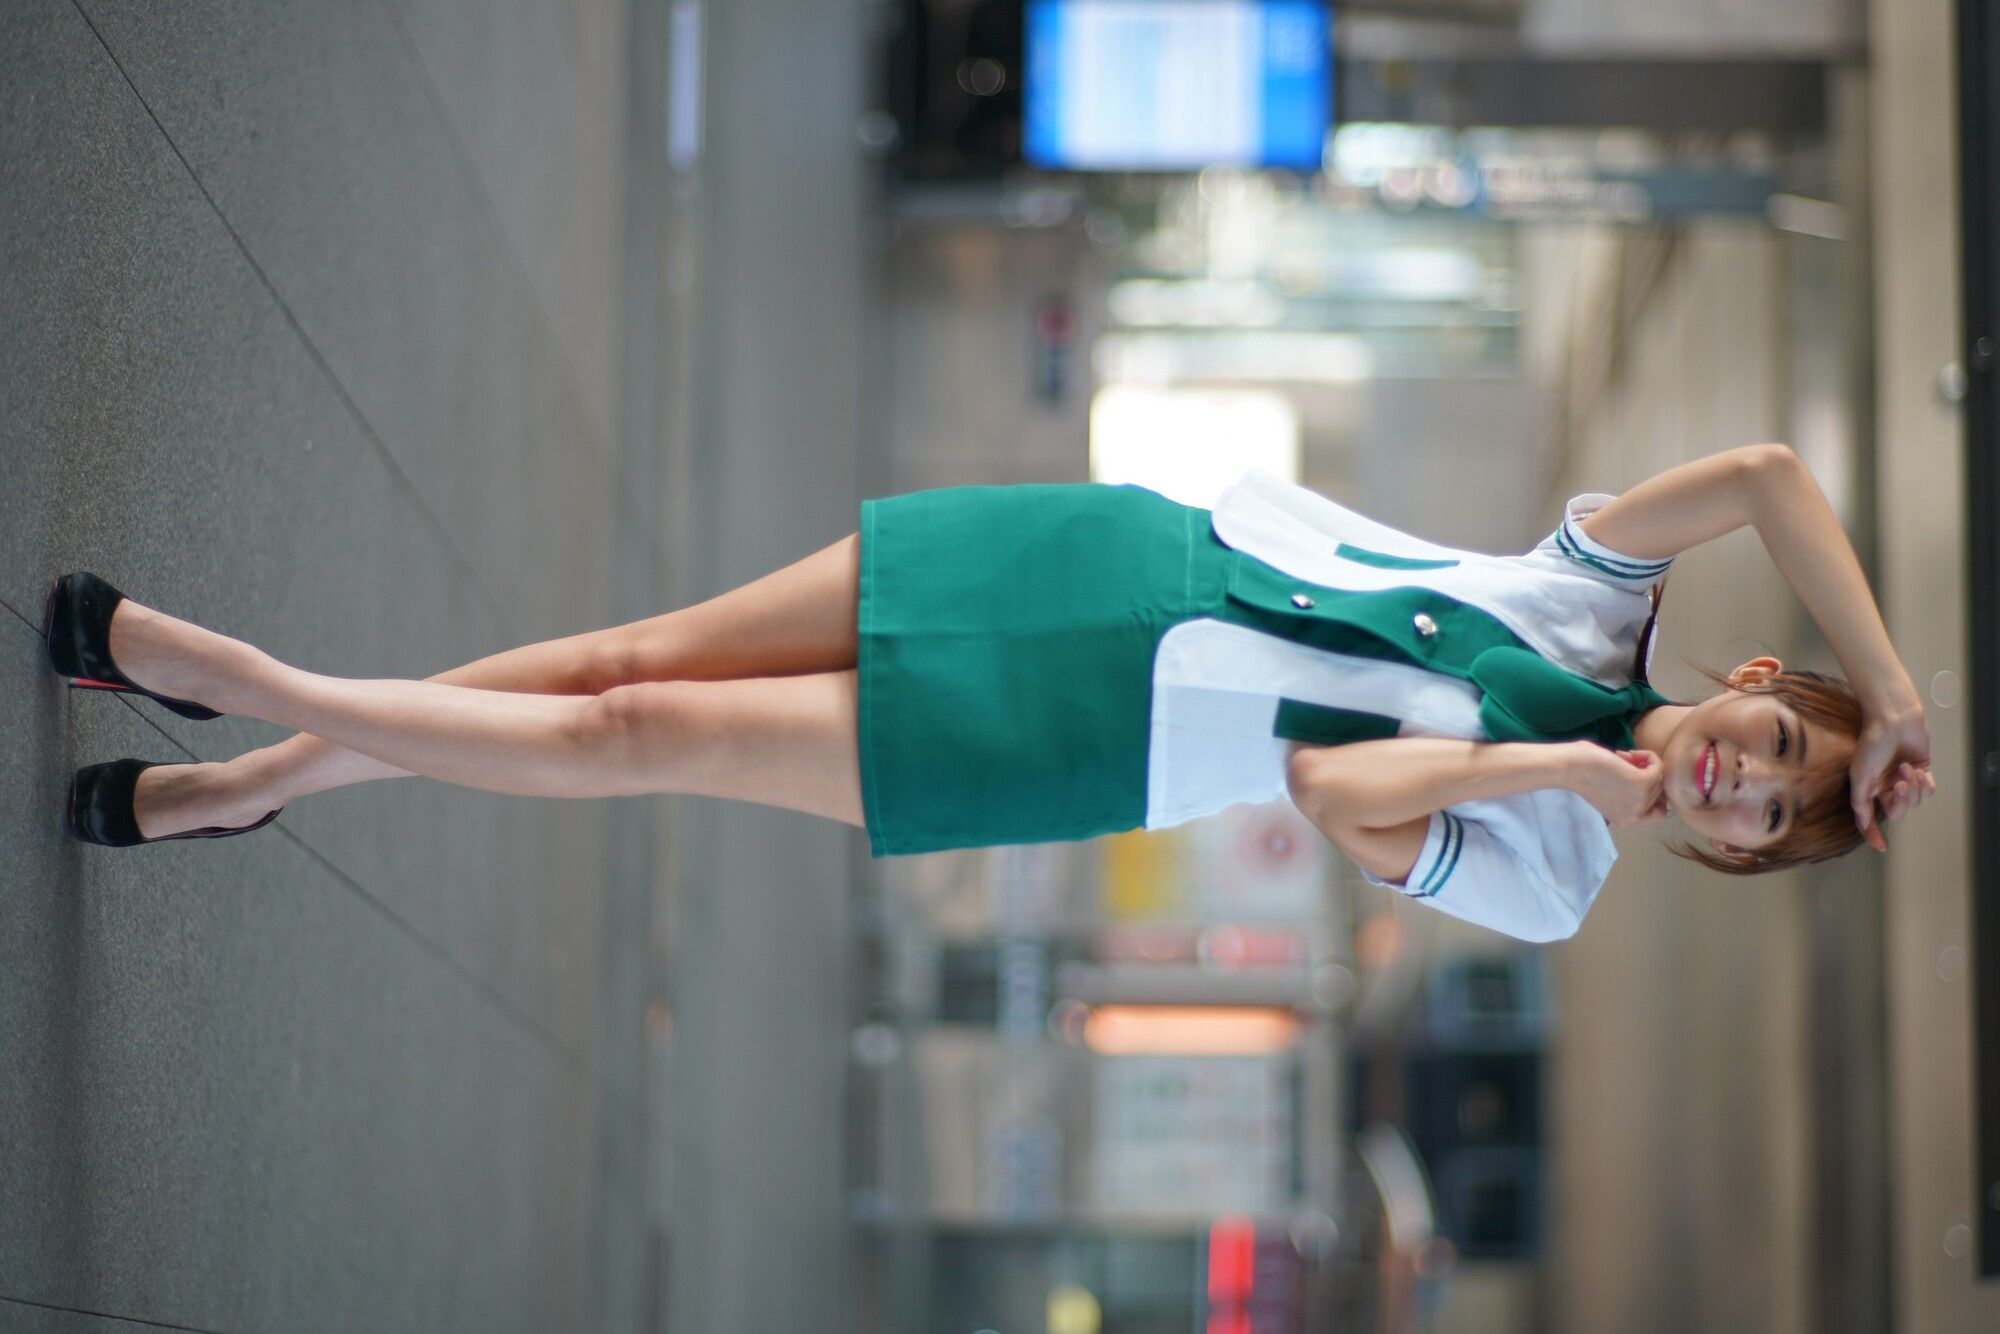 VOL.1839 [台湾正妹]美腿街拍空姐制服:苏郁媛超高清个人性感漂亮大图(136P)